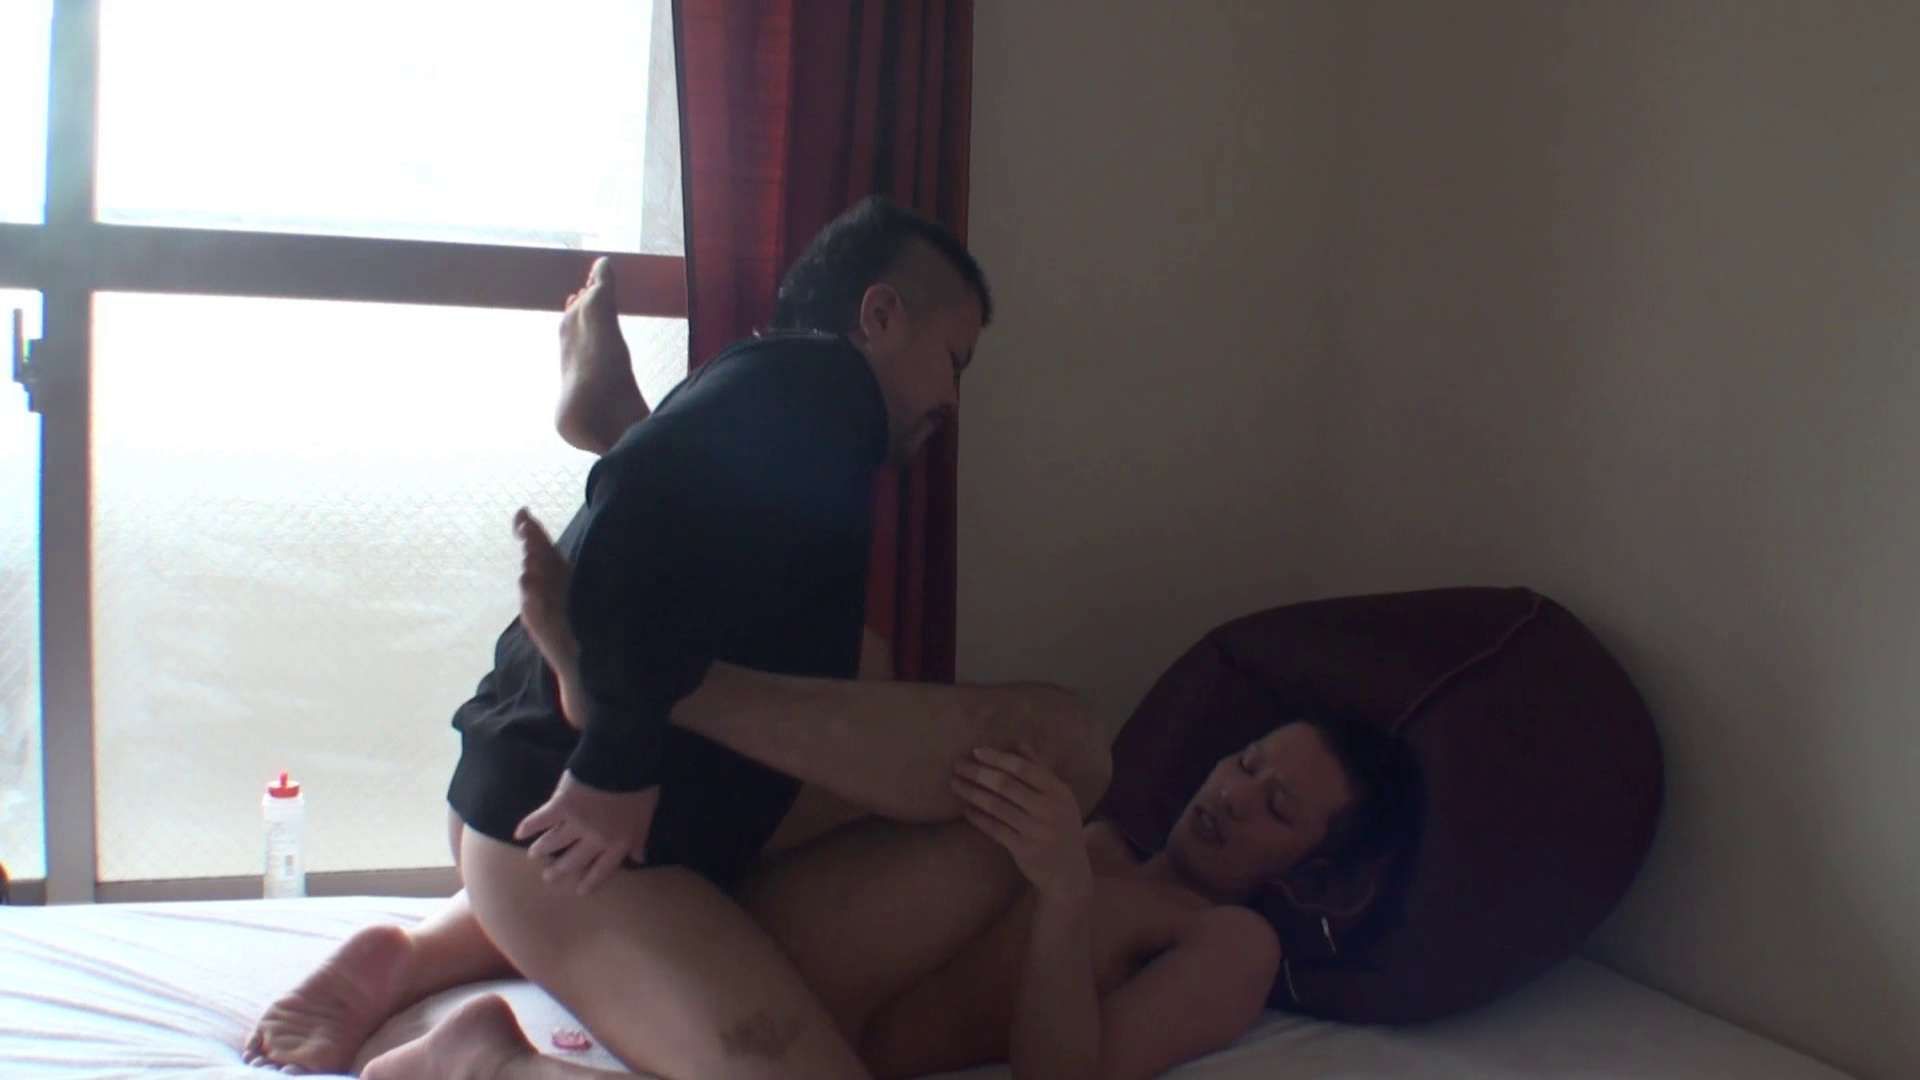 HD 良太と健二当たり前の日常 セックス編 男天国 | サル系ボーイズ  50pic 38